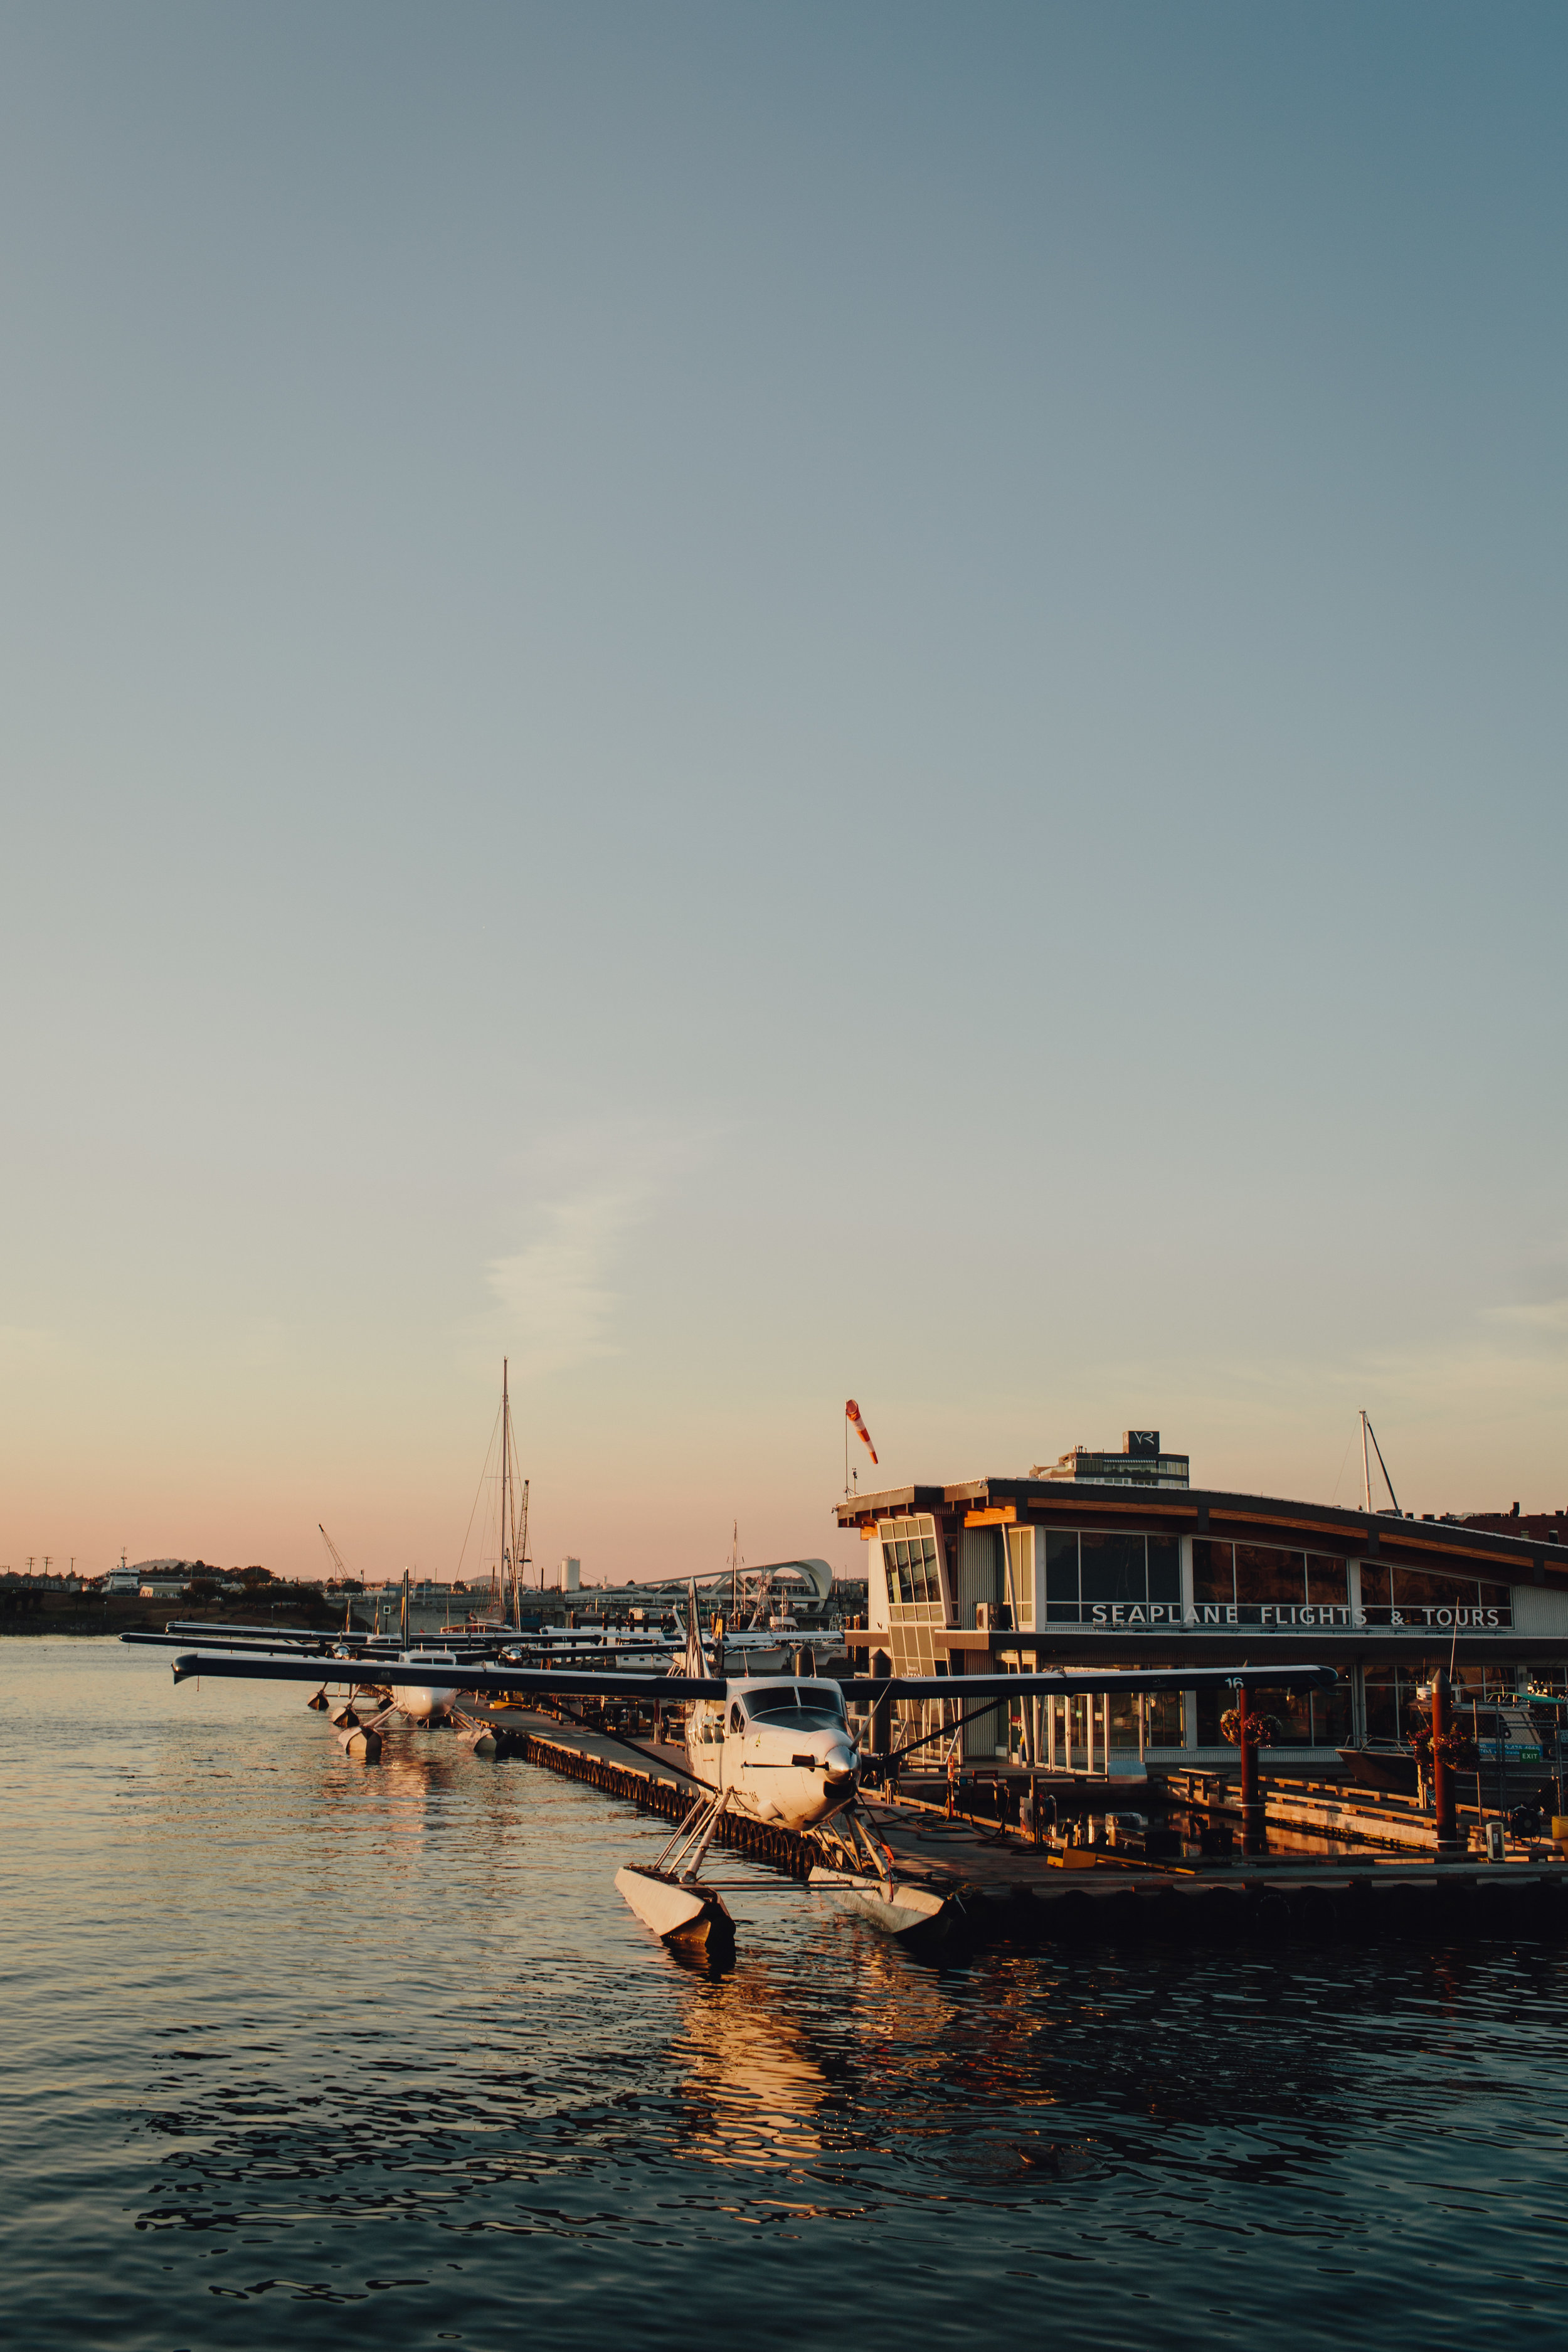 Harbour-0006.JPG